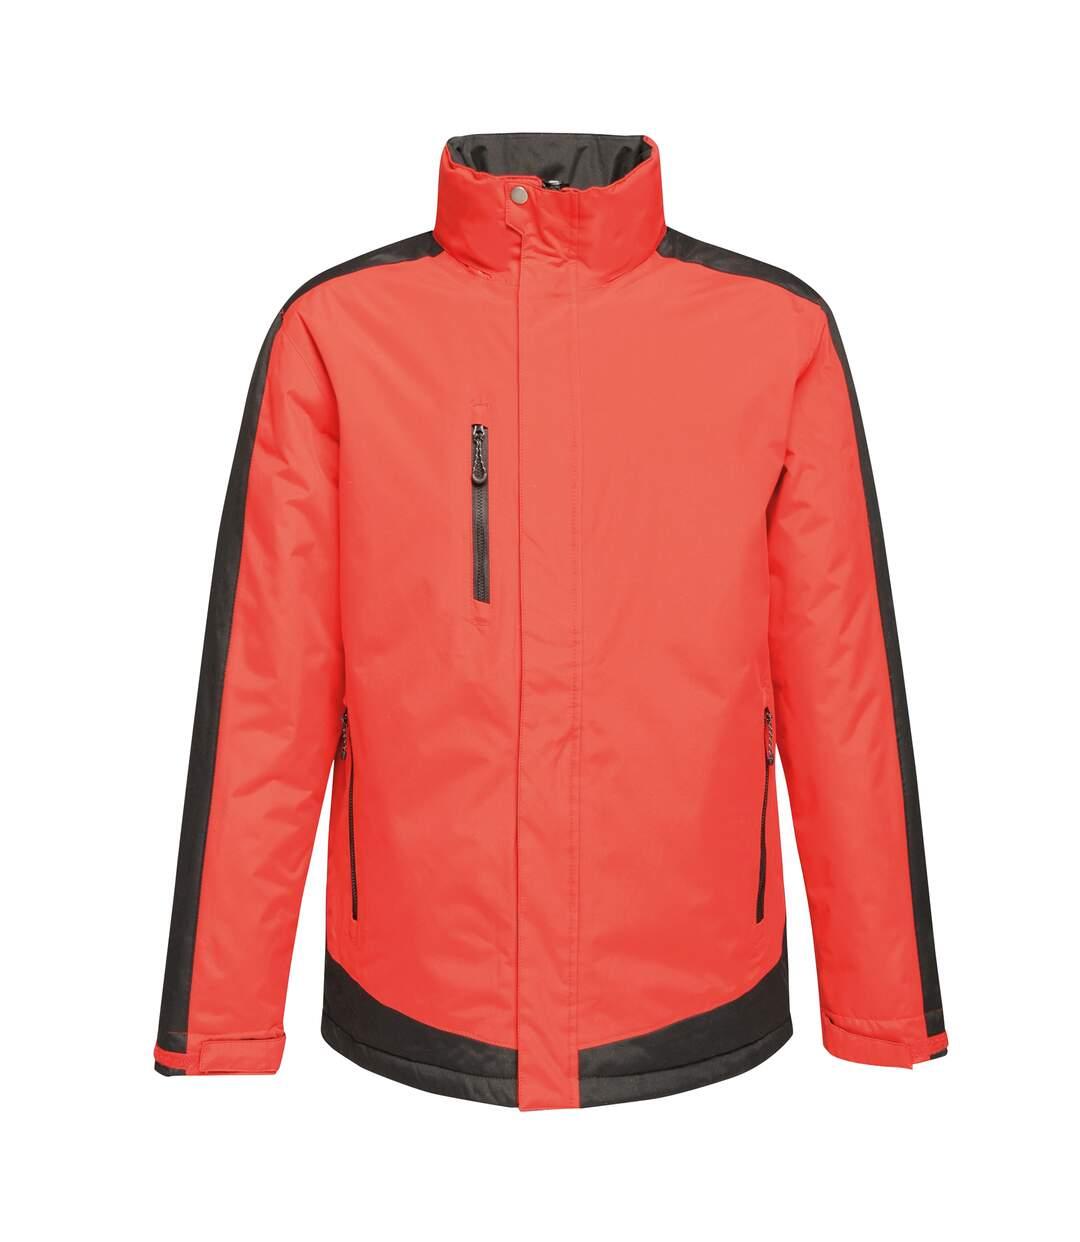 Regatta Contrast Mens Insulated jacket (Classic Red/Black) - UTRW6354